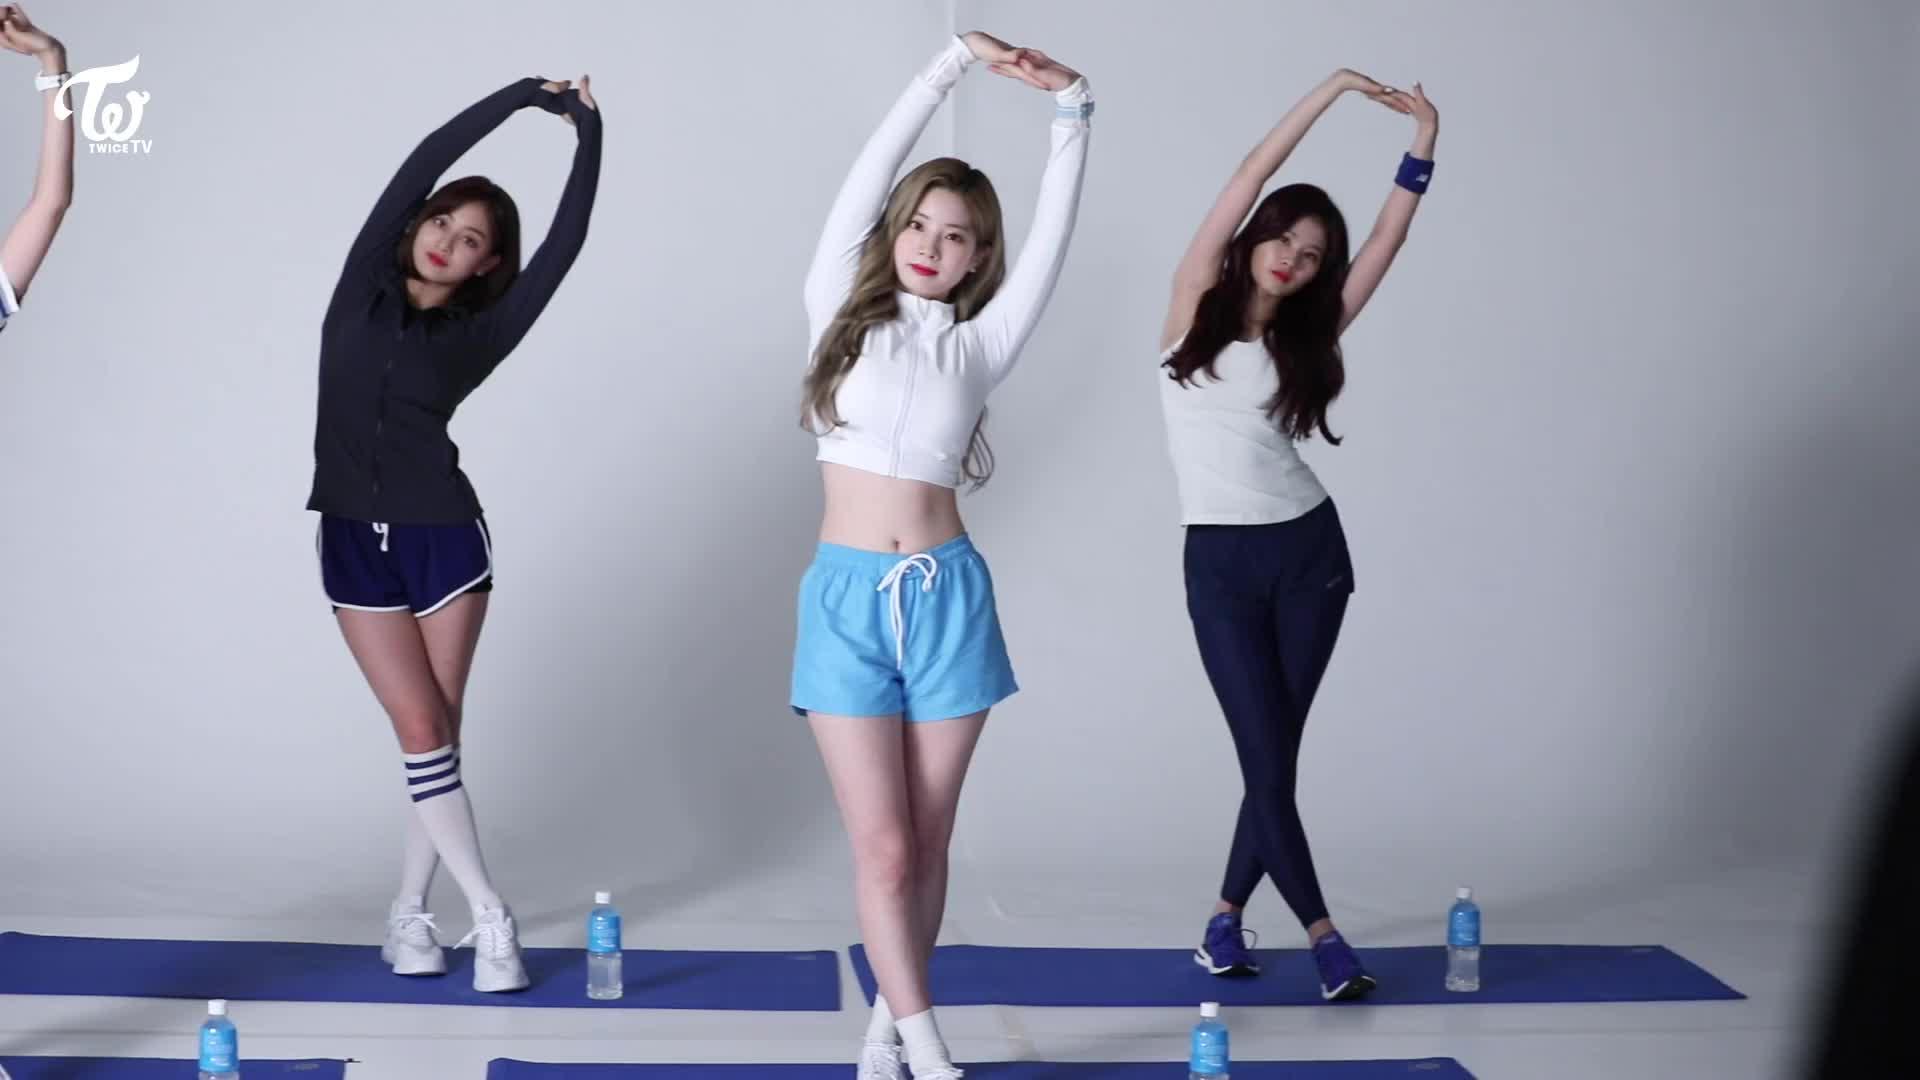 dahyun, jihyo, kpop, mina, sana, twice, tzuyu, Twice GIFs